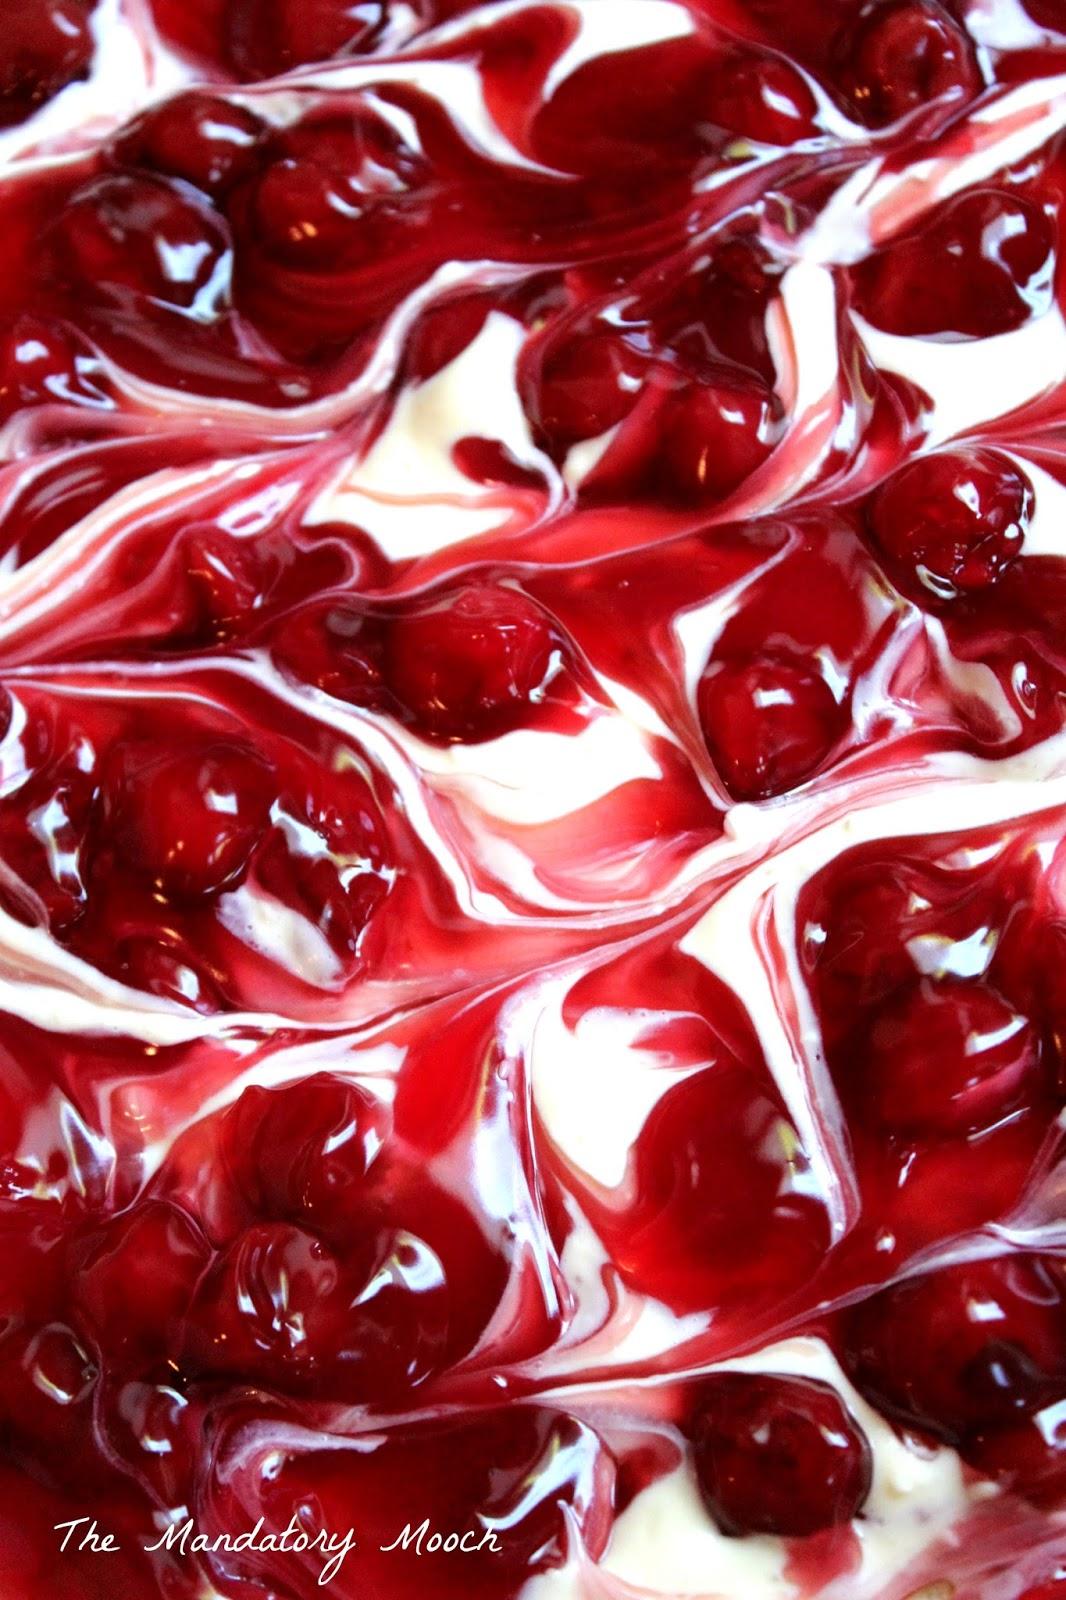 The Mandatory Mooch Cherry Cheesecake Surprise Layered